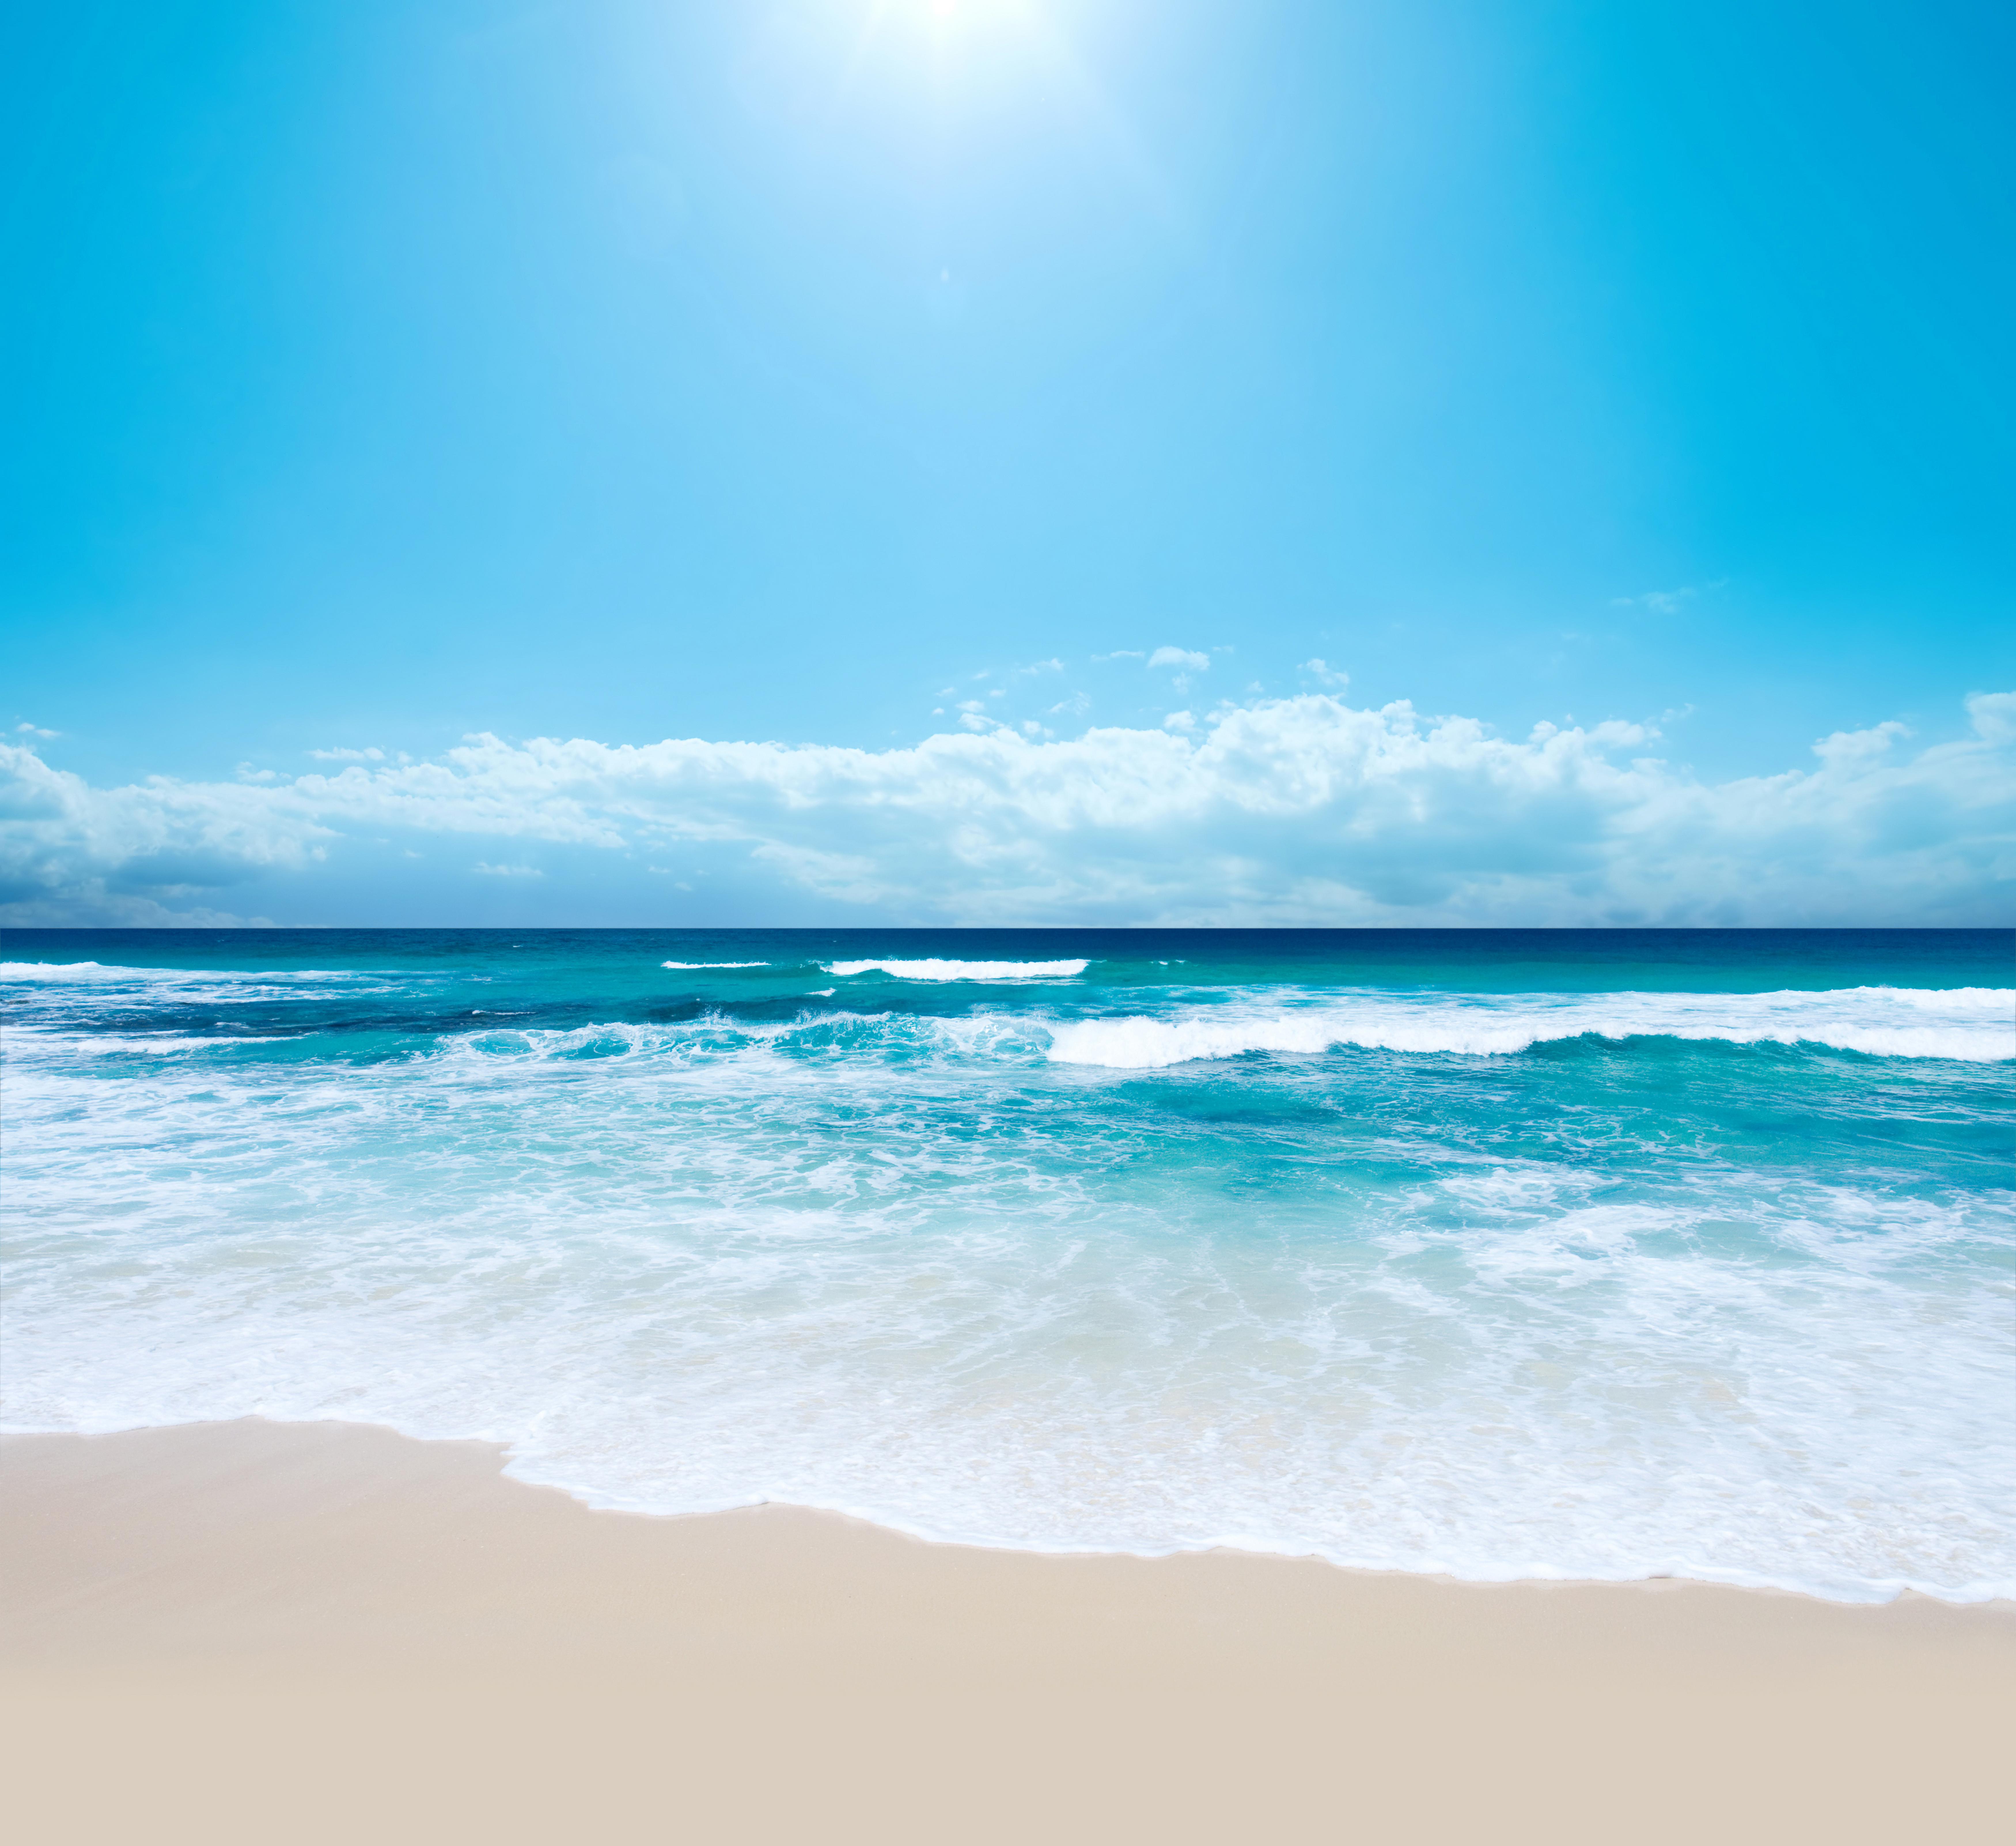 Sea clipart beach background #14